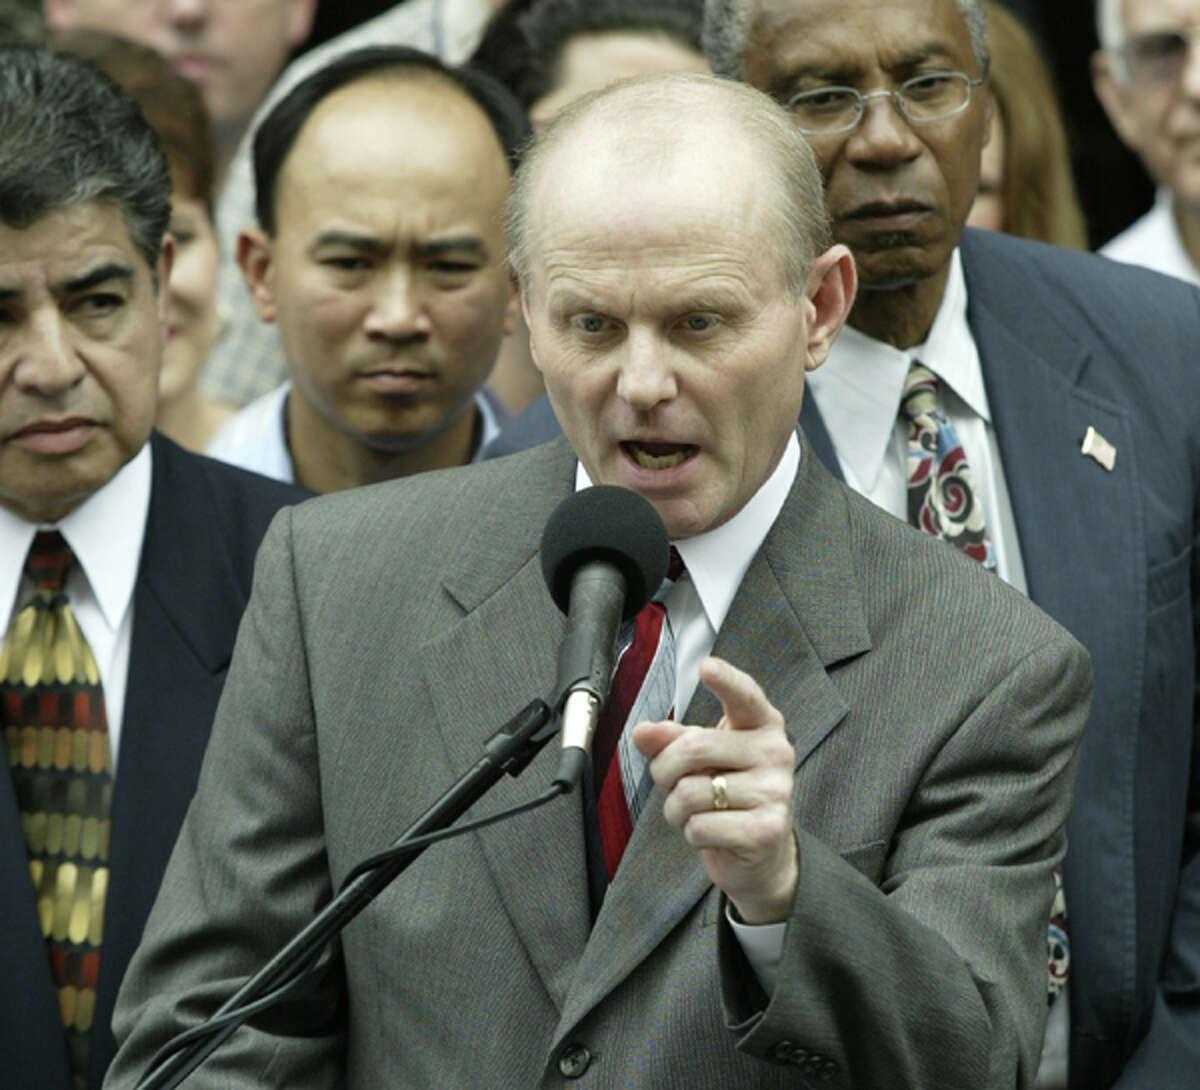 Pastor Steve Riggle of the Grace Community Church in 2003.